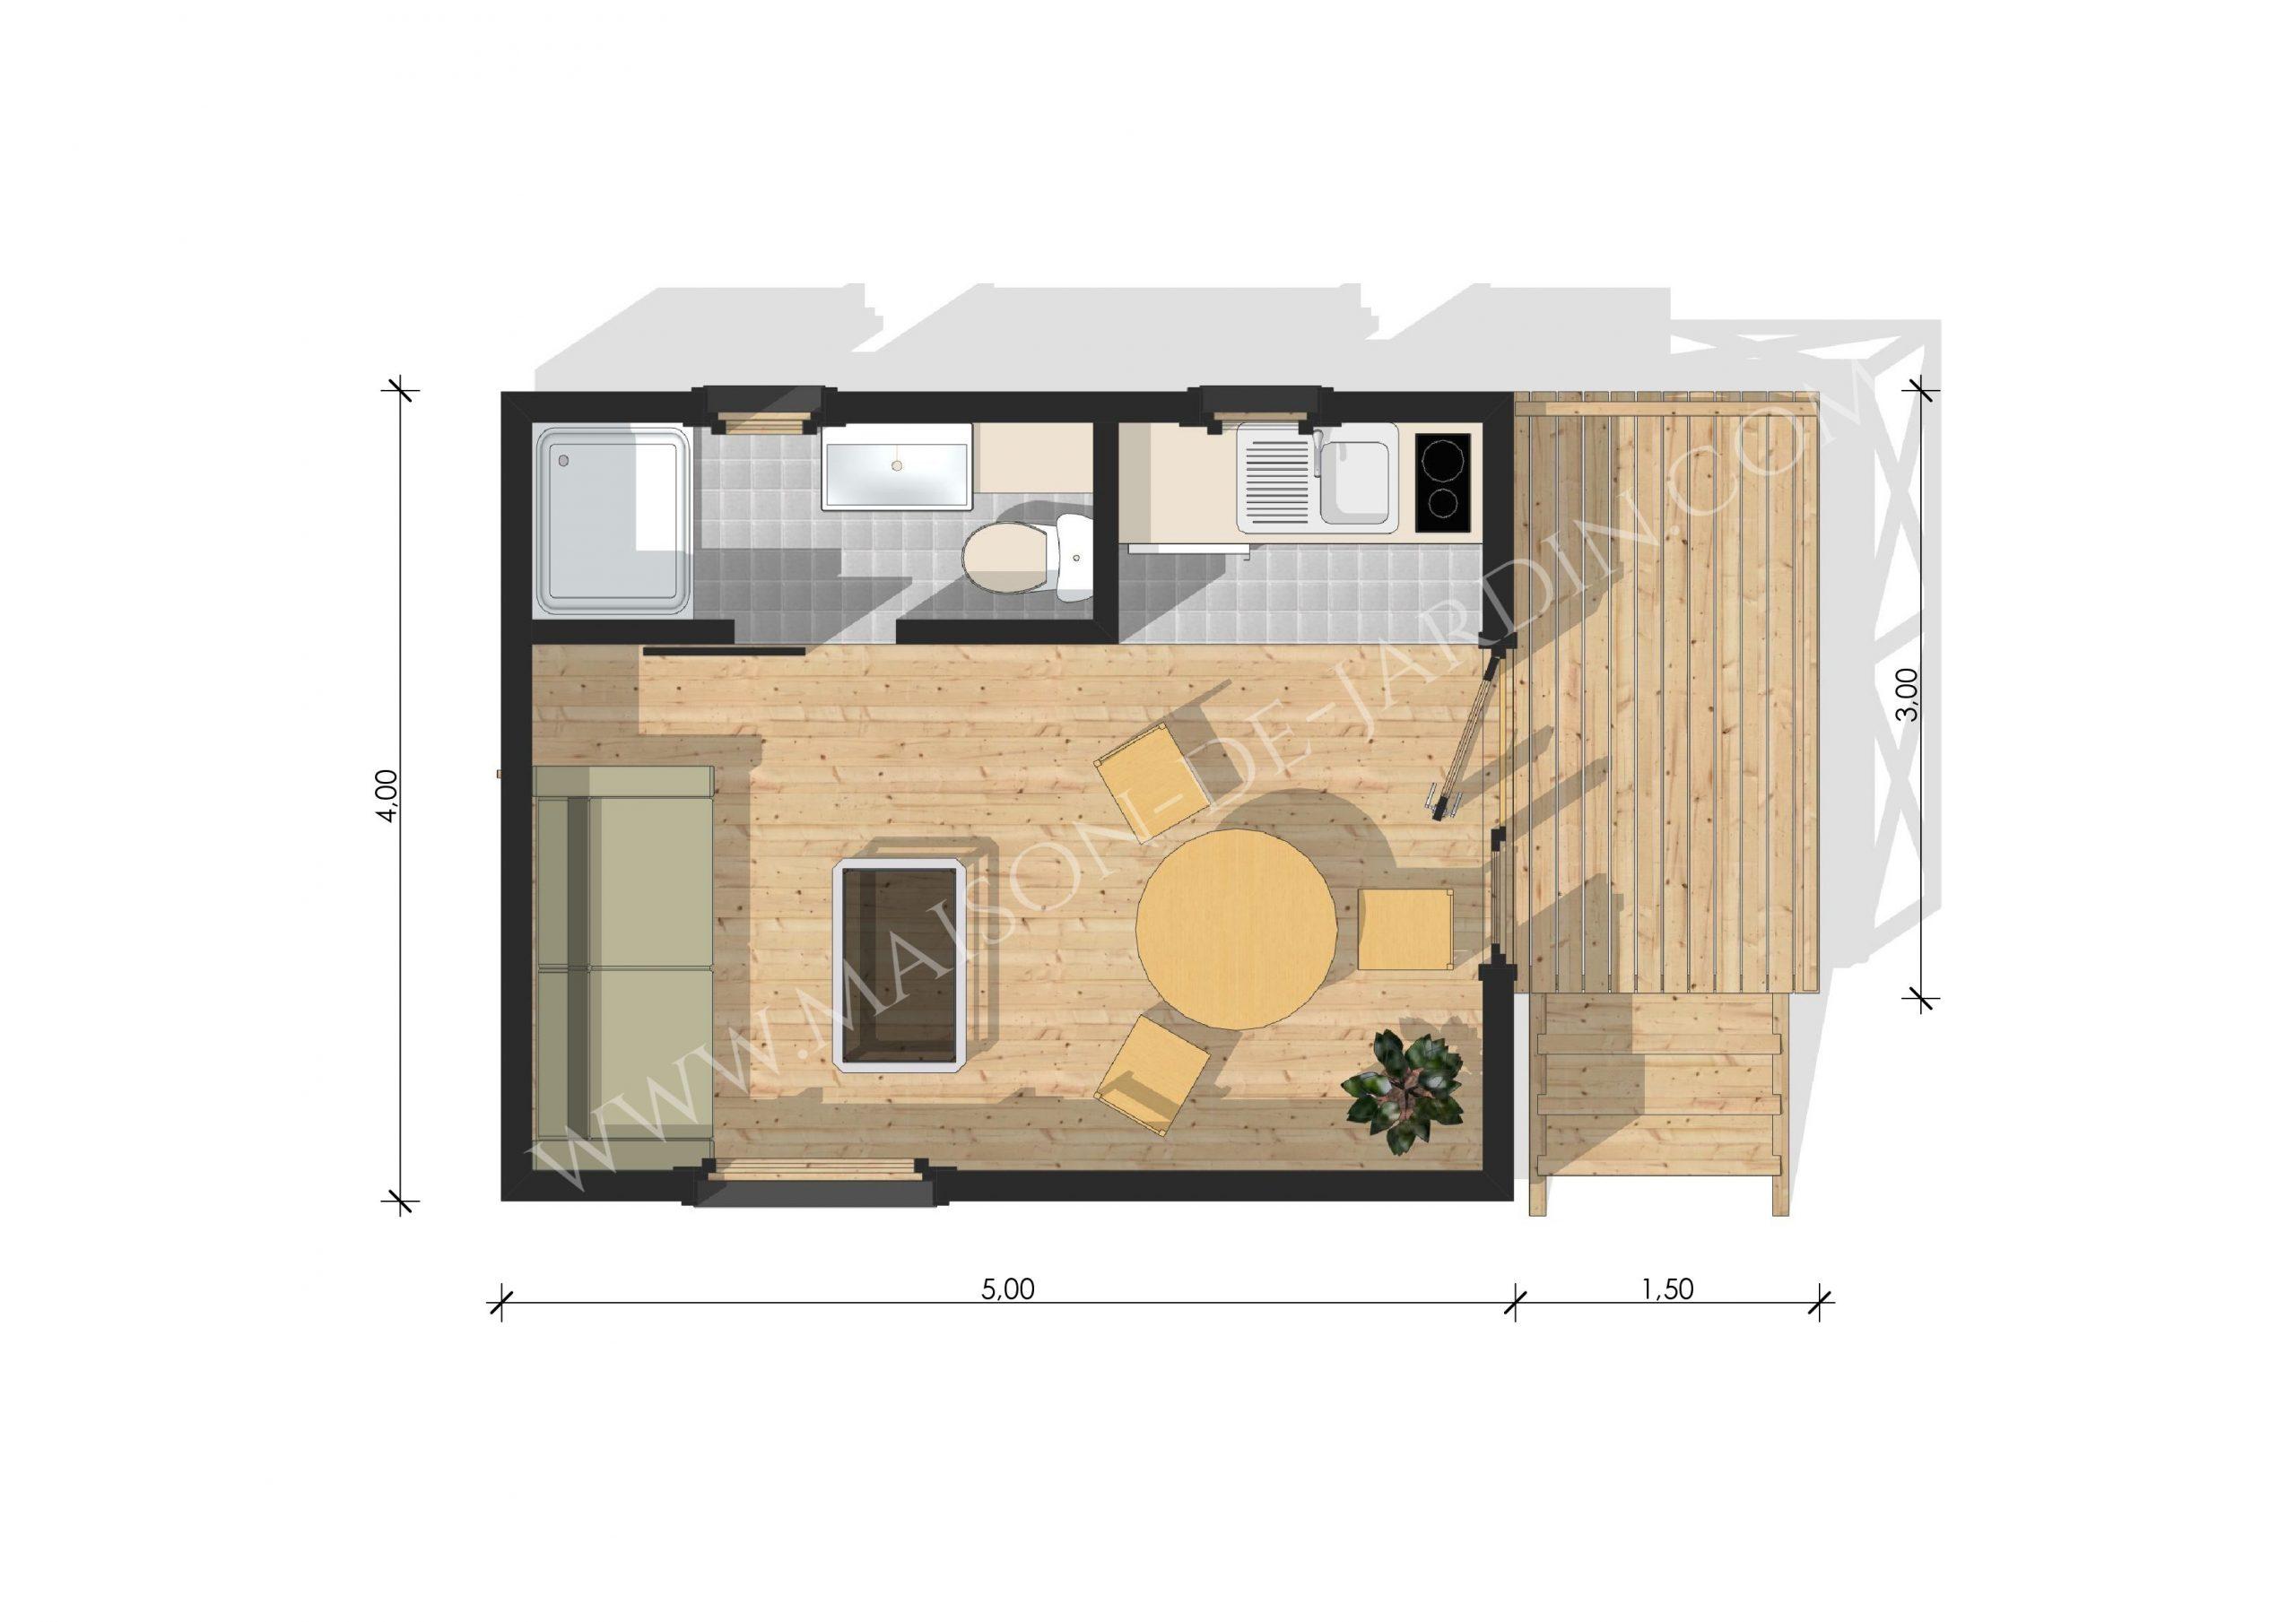 Studio De Jardin Avec Ossature Bois Lyon 20 M² : 26900 € Ttc ... pour Studio De Jardin Prix